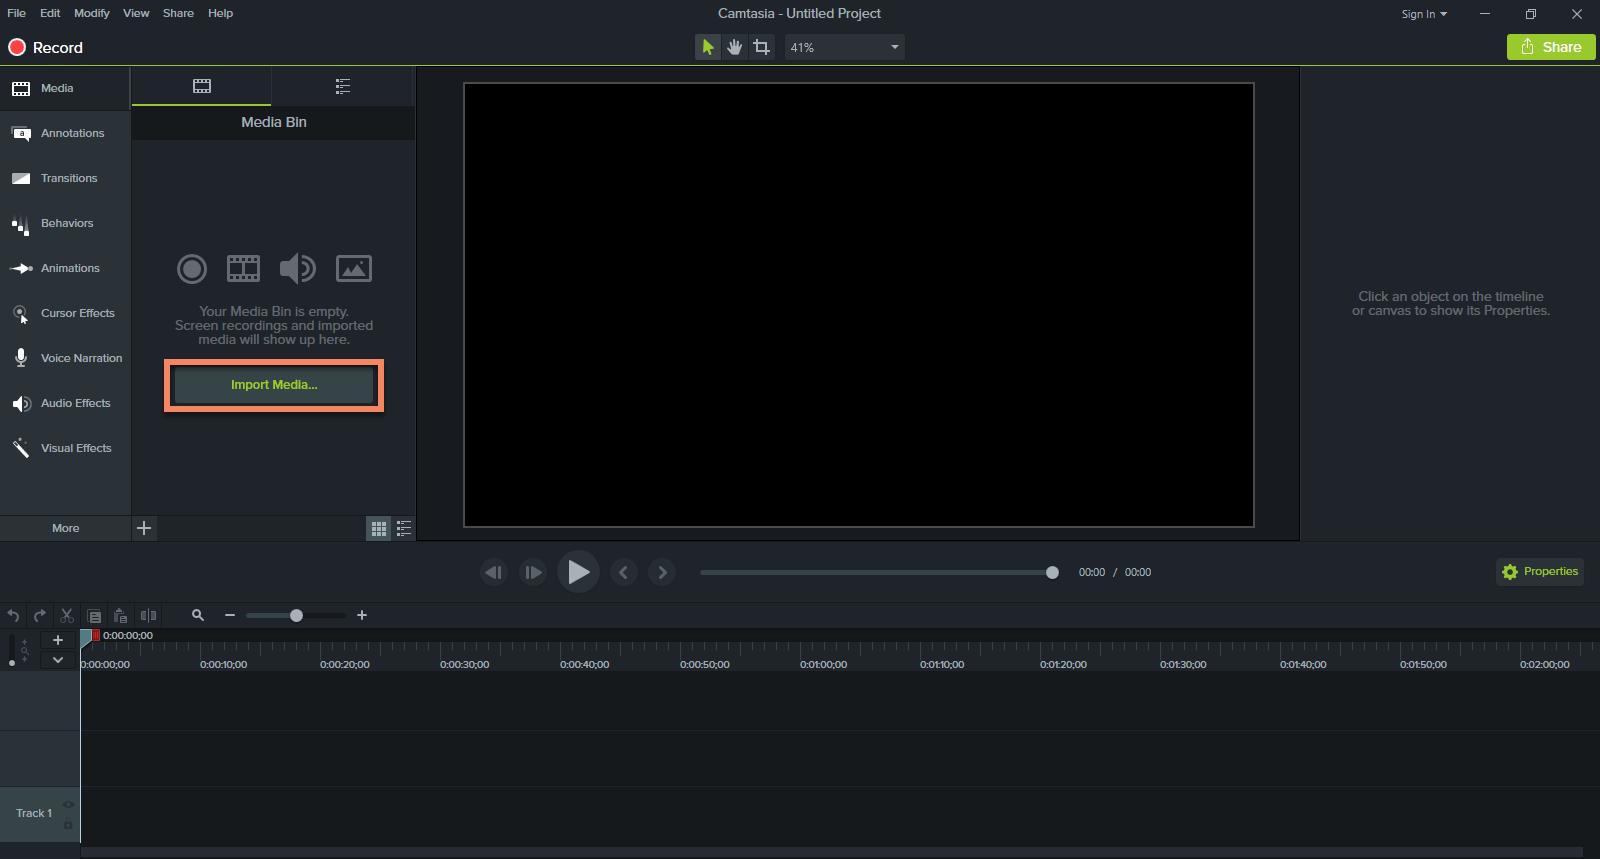 Camtasia Studio 9 Interface